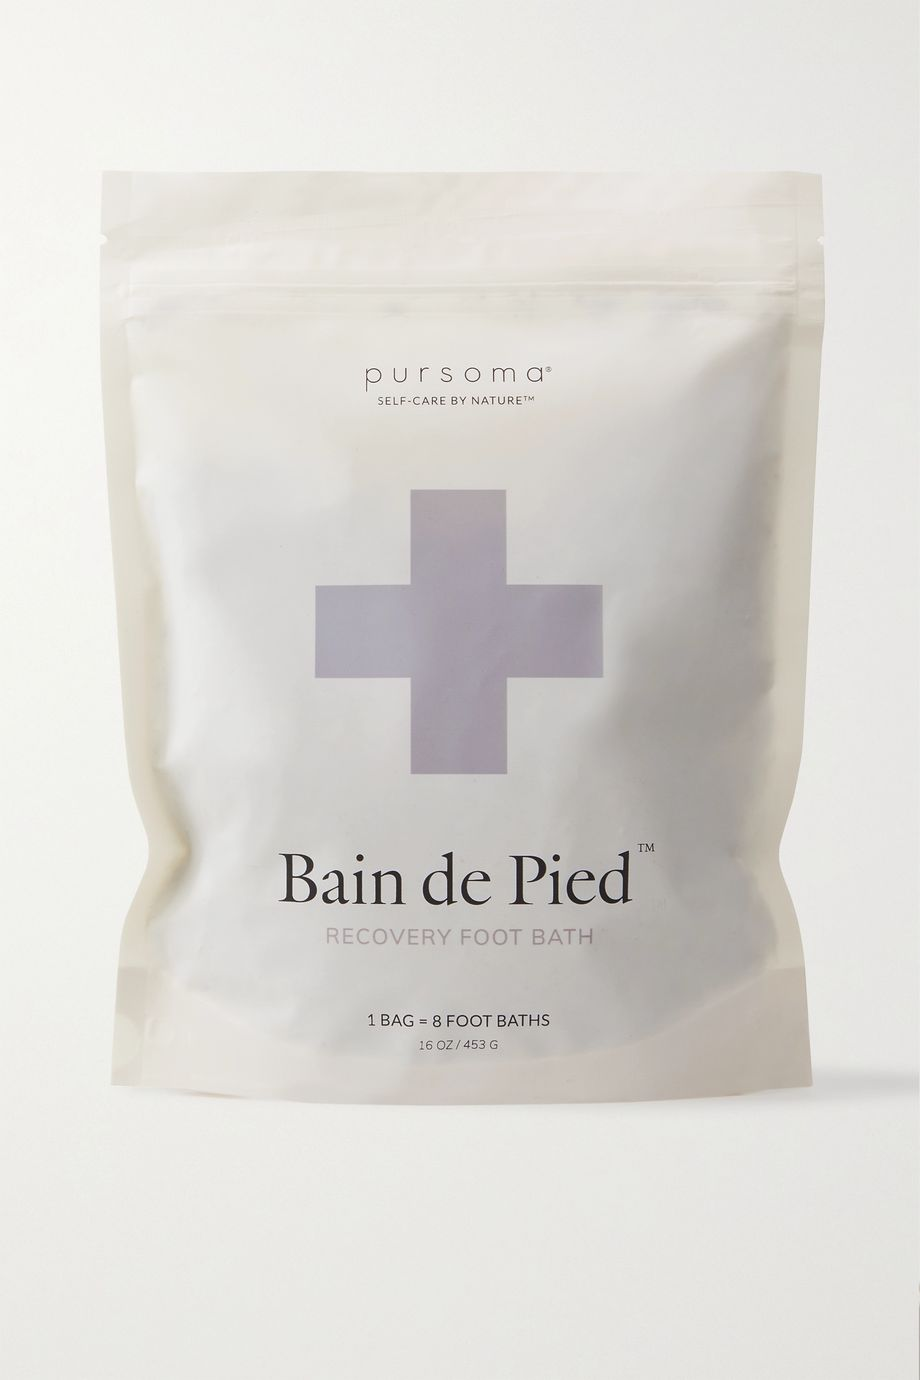 Pursoma Bain de Pied Recovery Foot Soak, 57 g – Fußbad